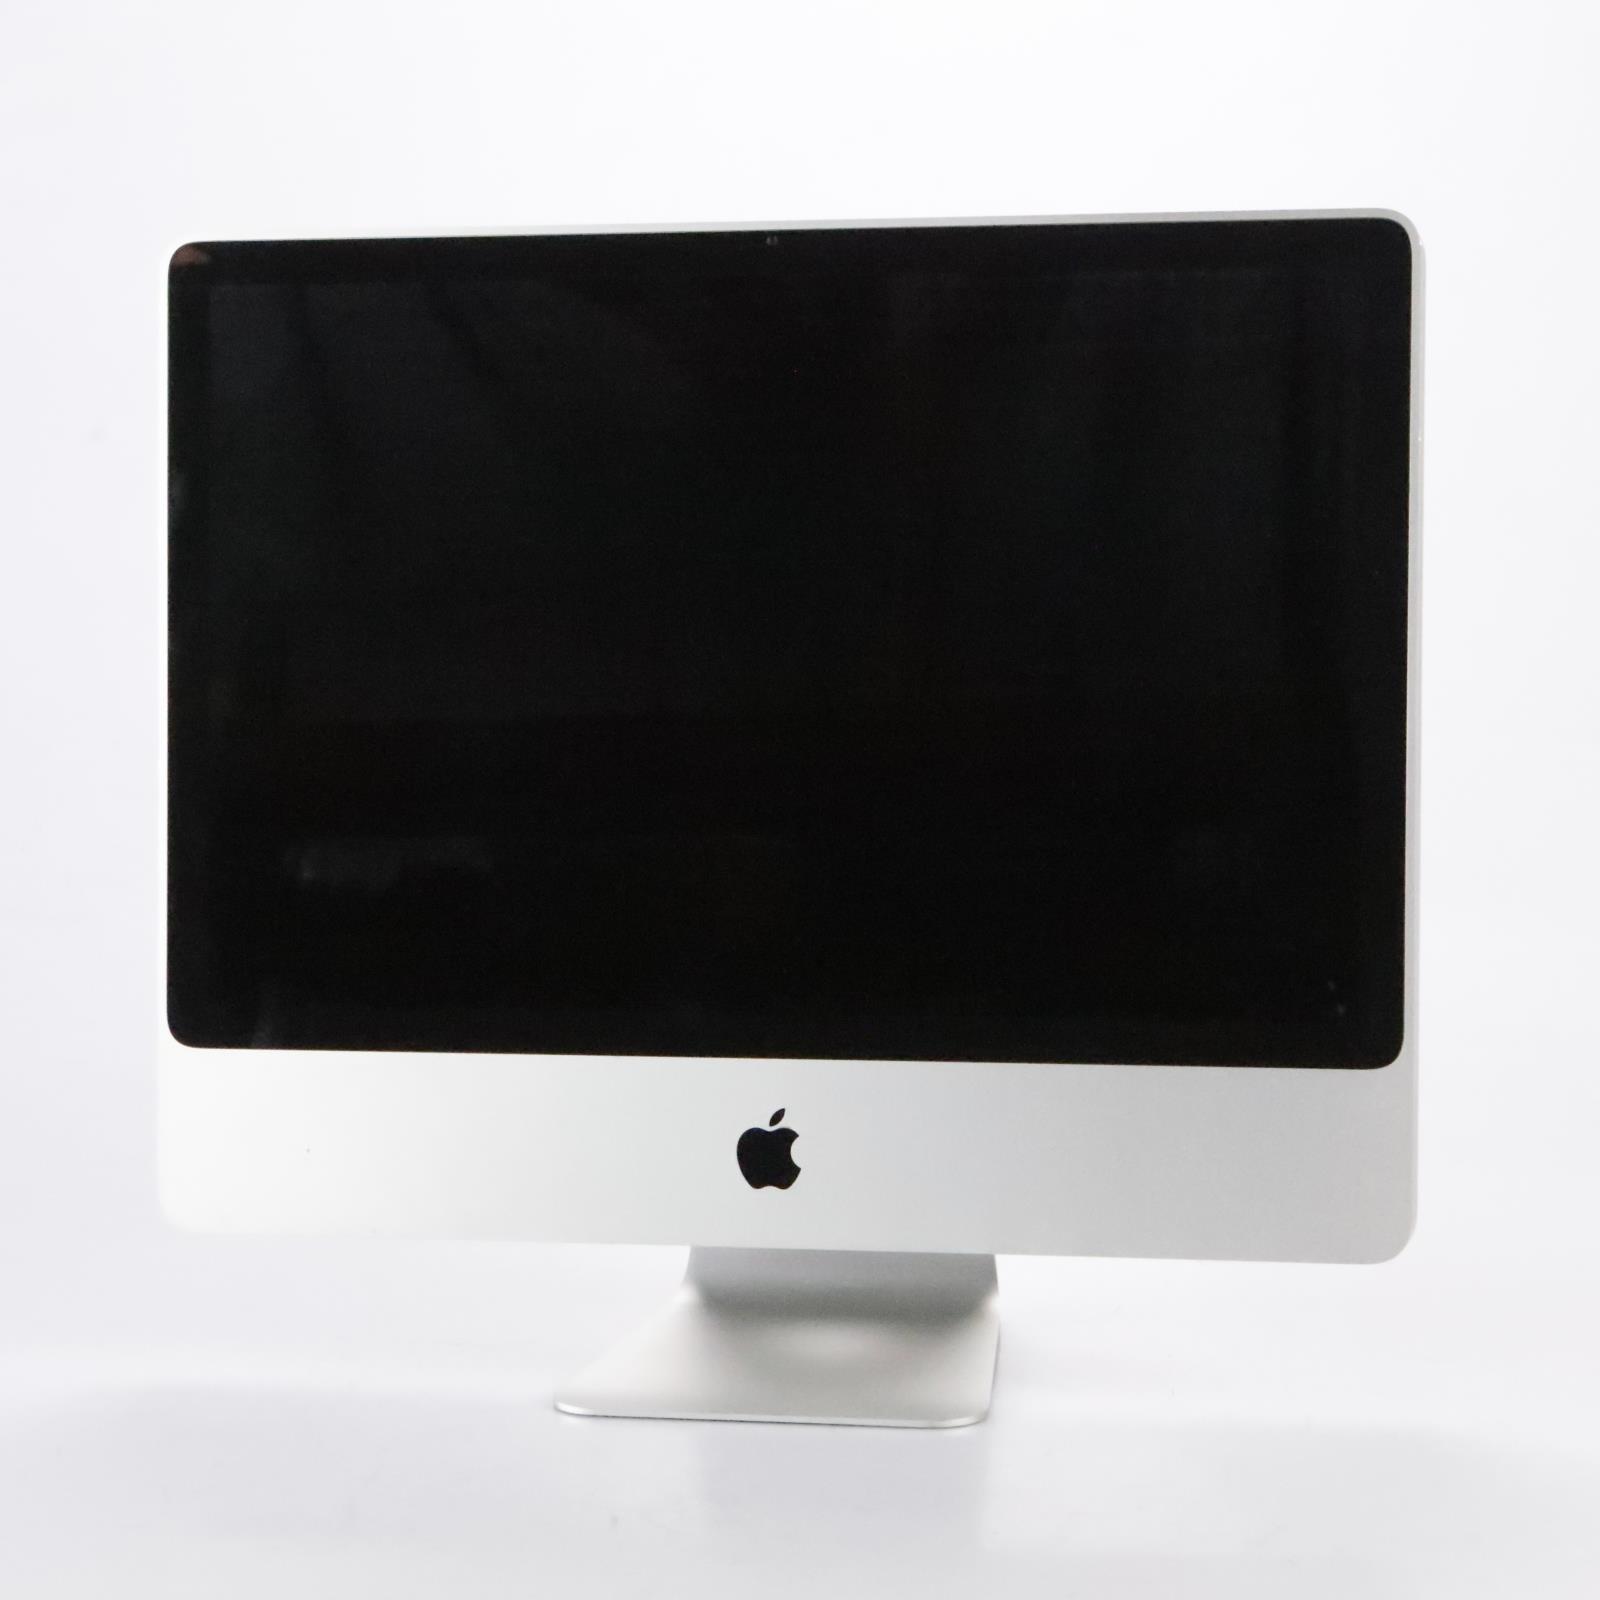 "Apple 24"" iMac 2.93 GHz Intel Core 2 Duo 640GB 8GB RAM 2009 El Capitan #35174"